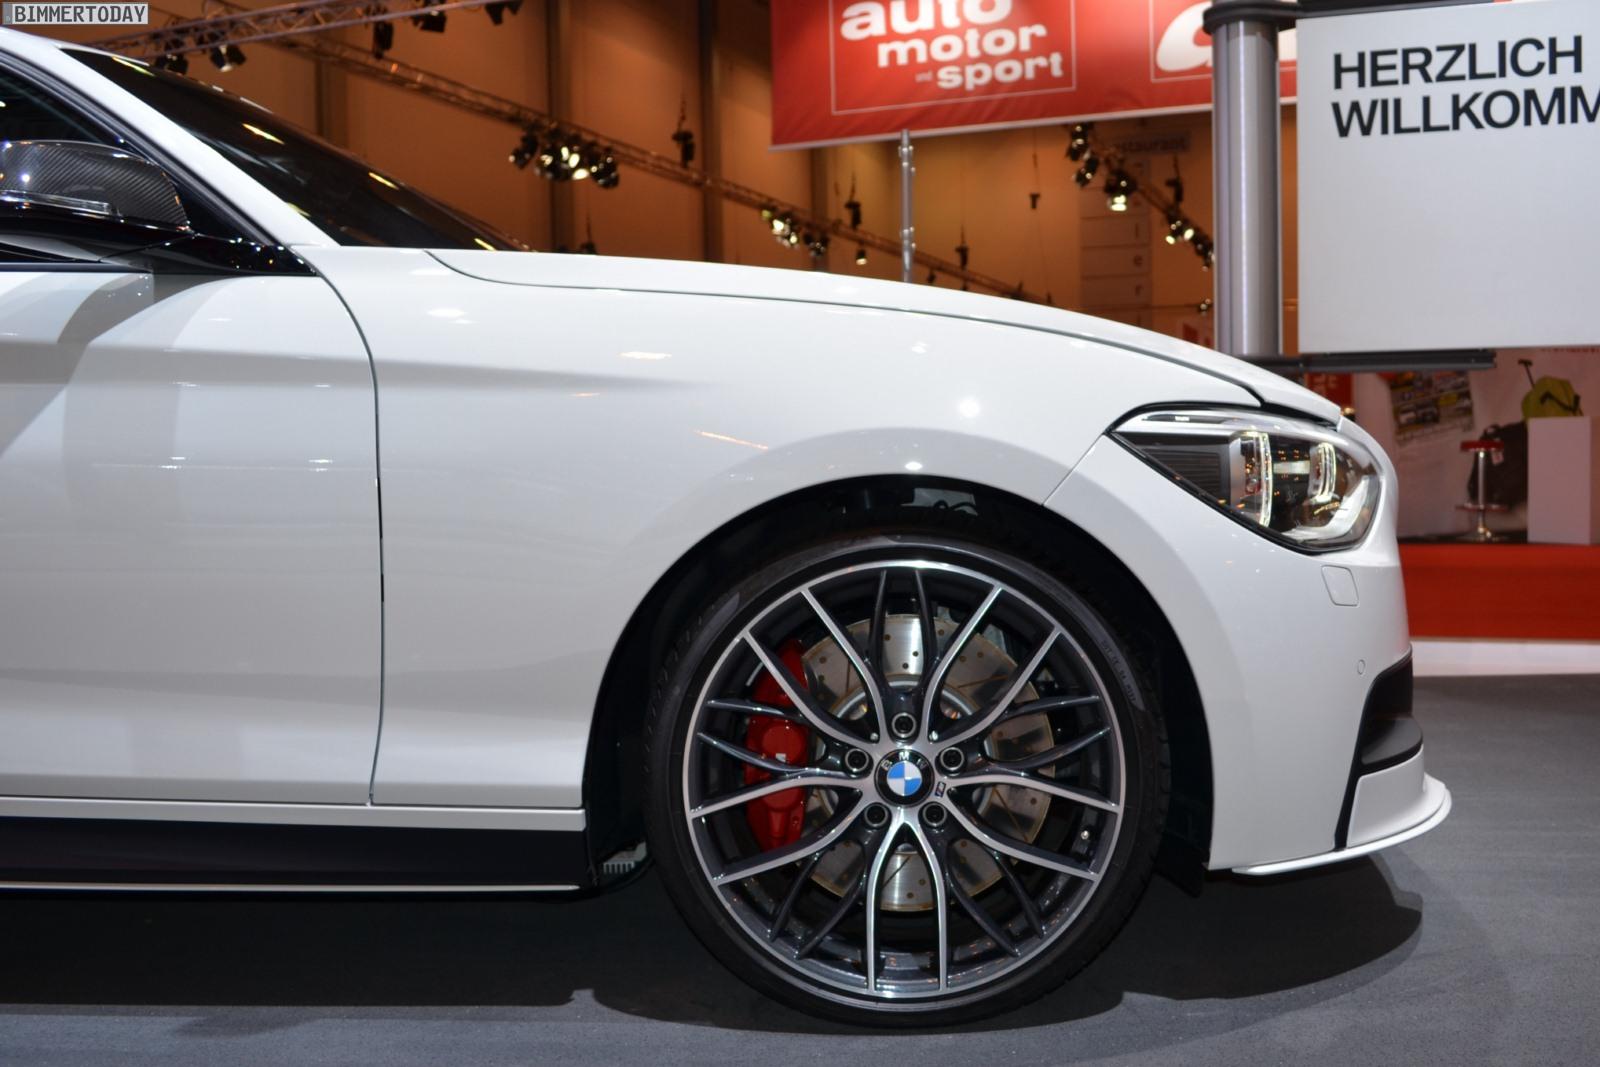 BMW M Performance 125i 1er F20 Tuning Essen Motor Show 2012 02